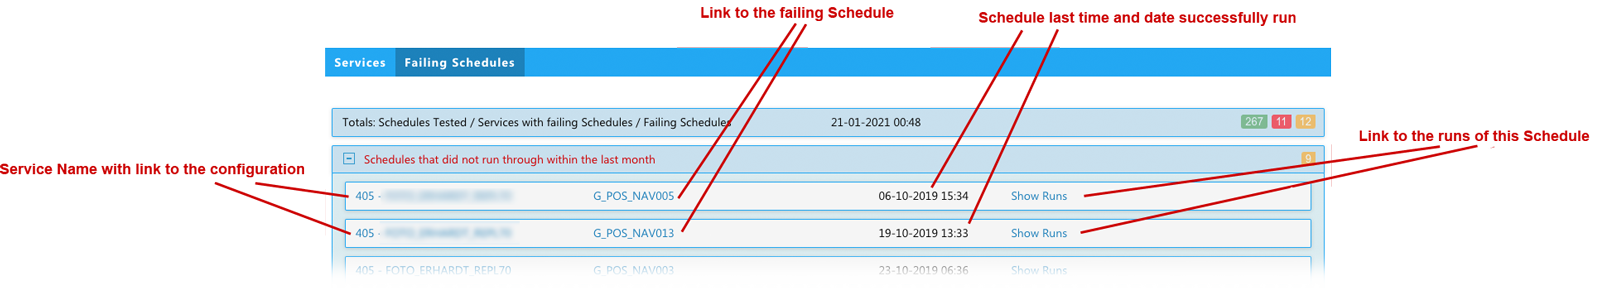 failing schedules details